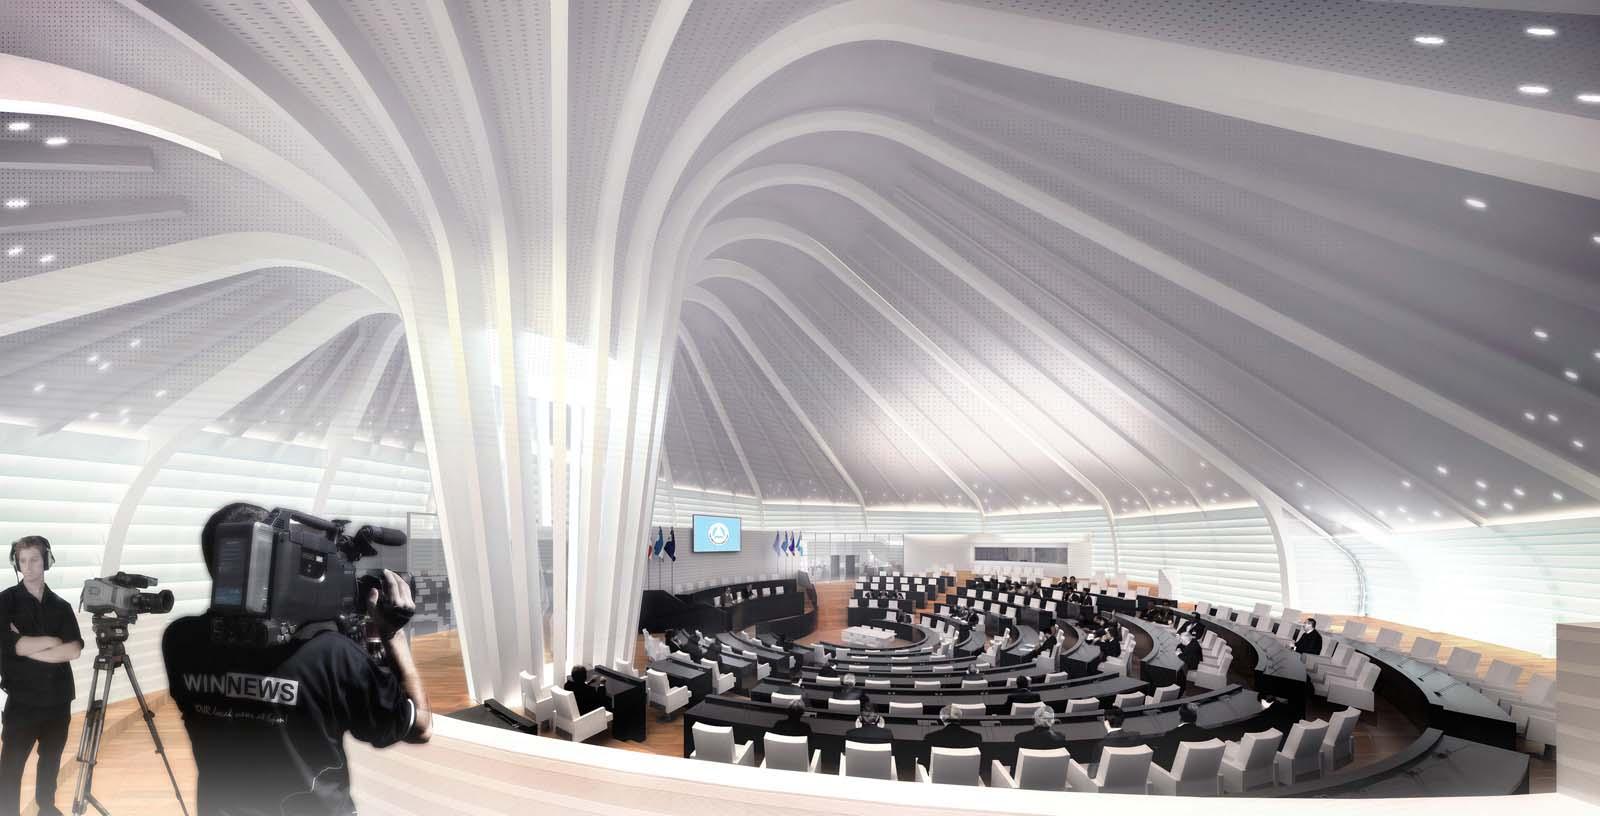 Central_American_Parliament_02_Architecture_IDOM_computer_graphics_Poliedro